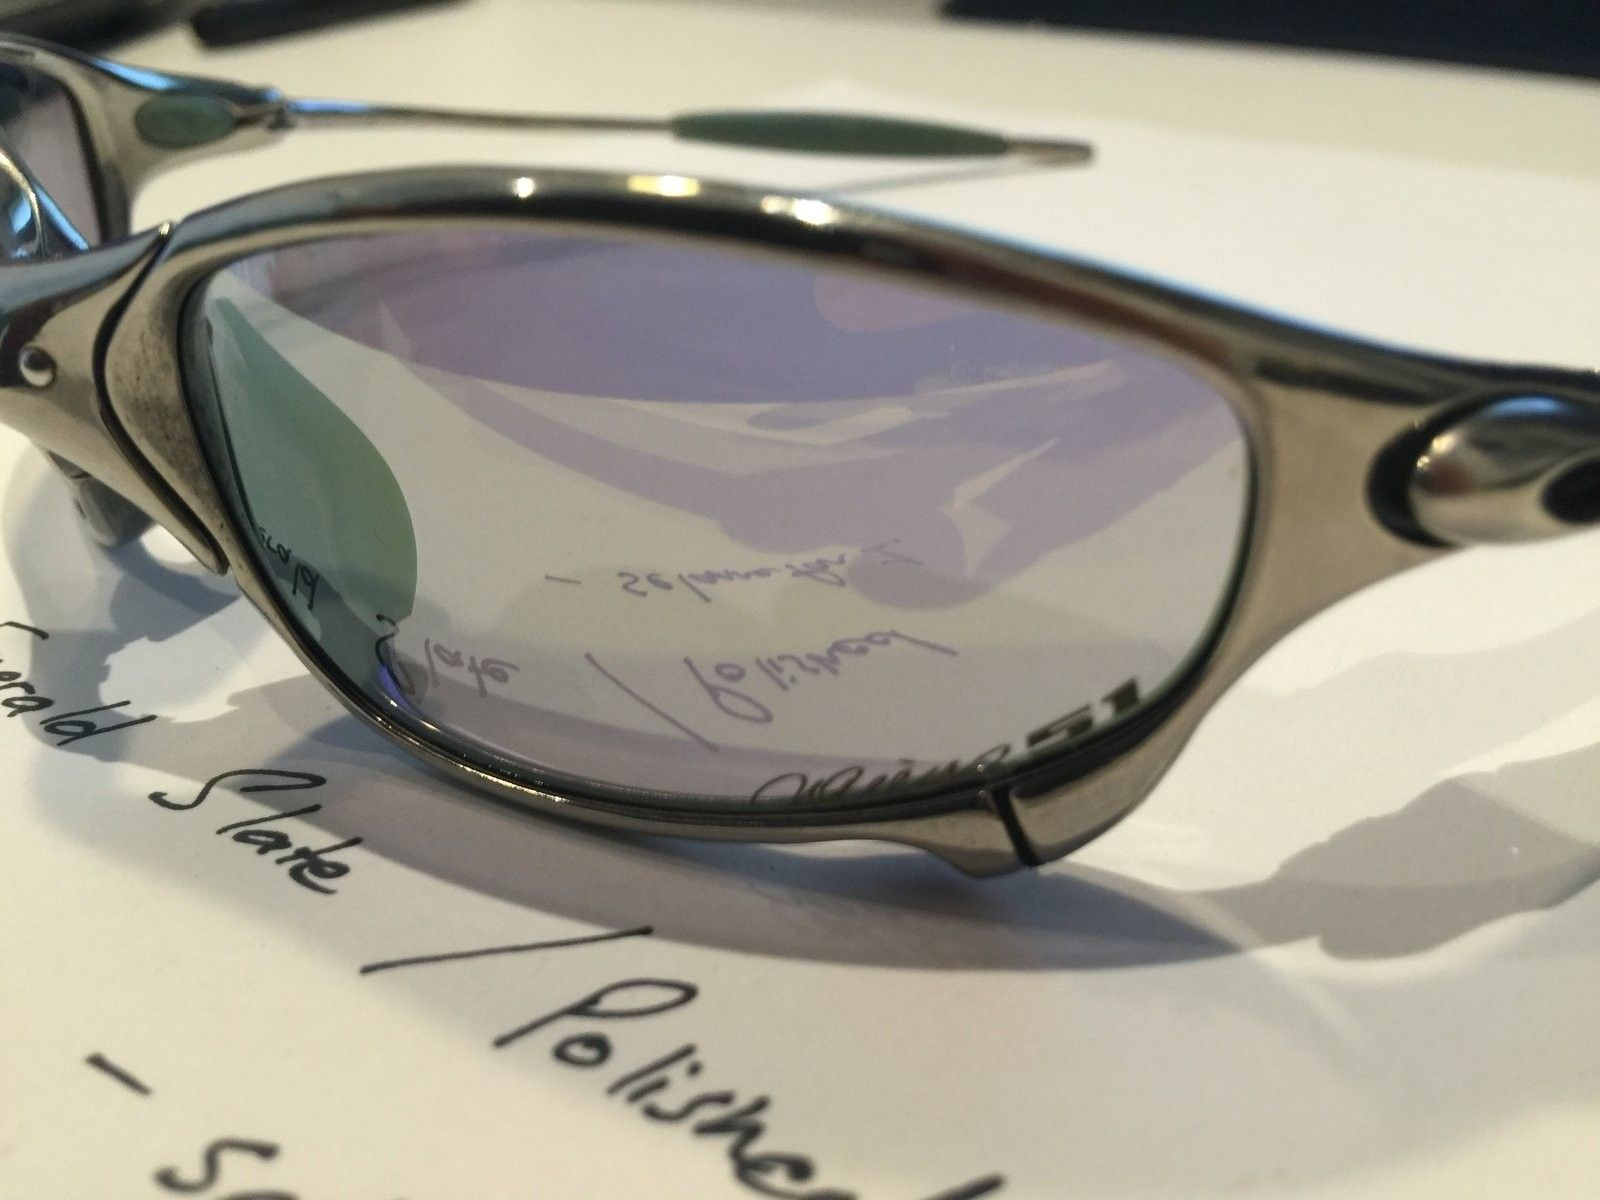 Ichiro Emerald Slate / Polished Frame Juliets (with box) - IMG_3818.JPG